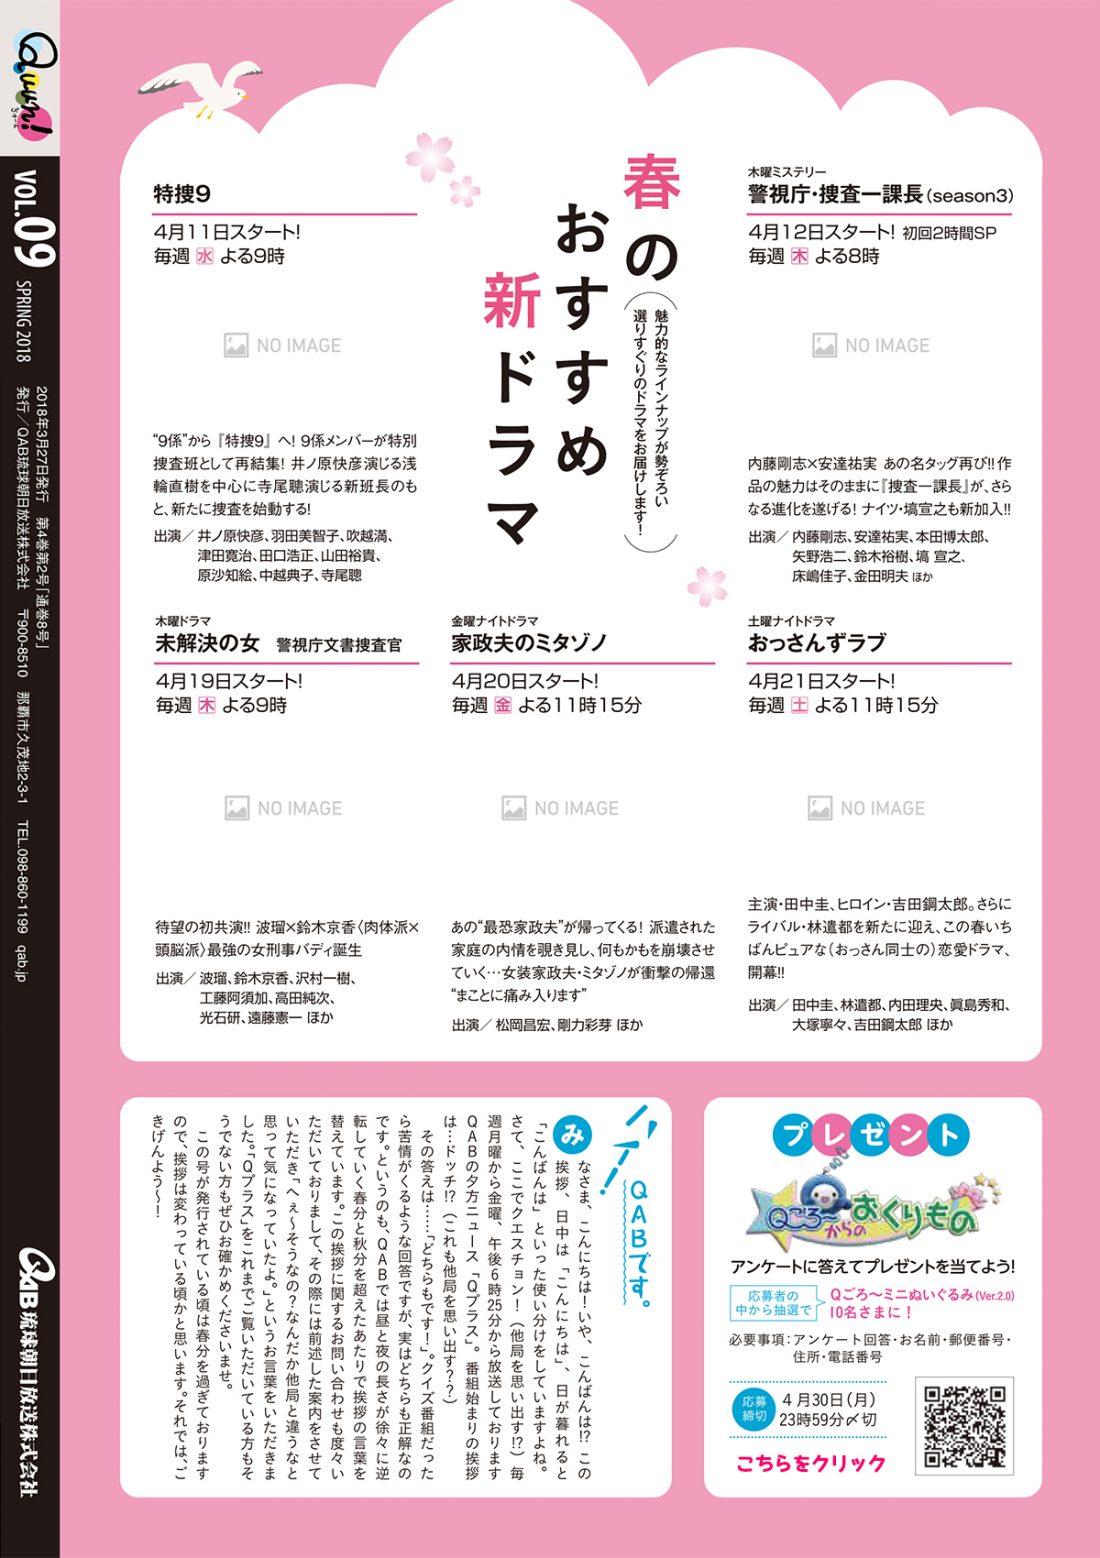 http://www.qab.co.jp/qgoro/wp-content/uploads/quun_0915_3-1100x1558.jpg